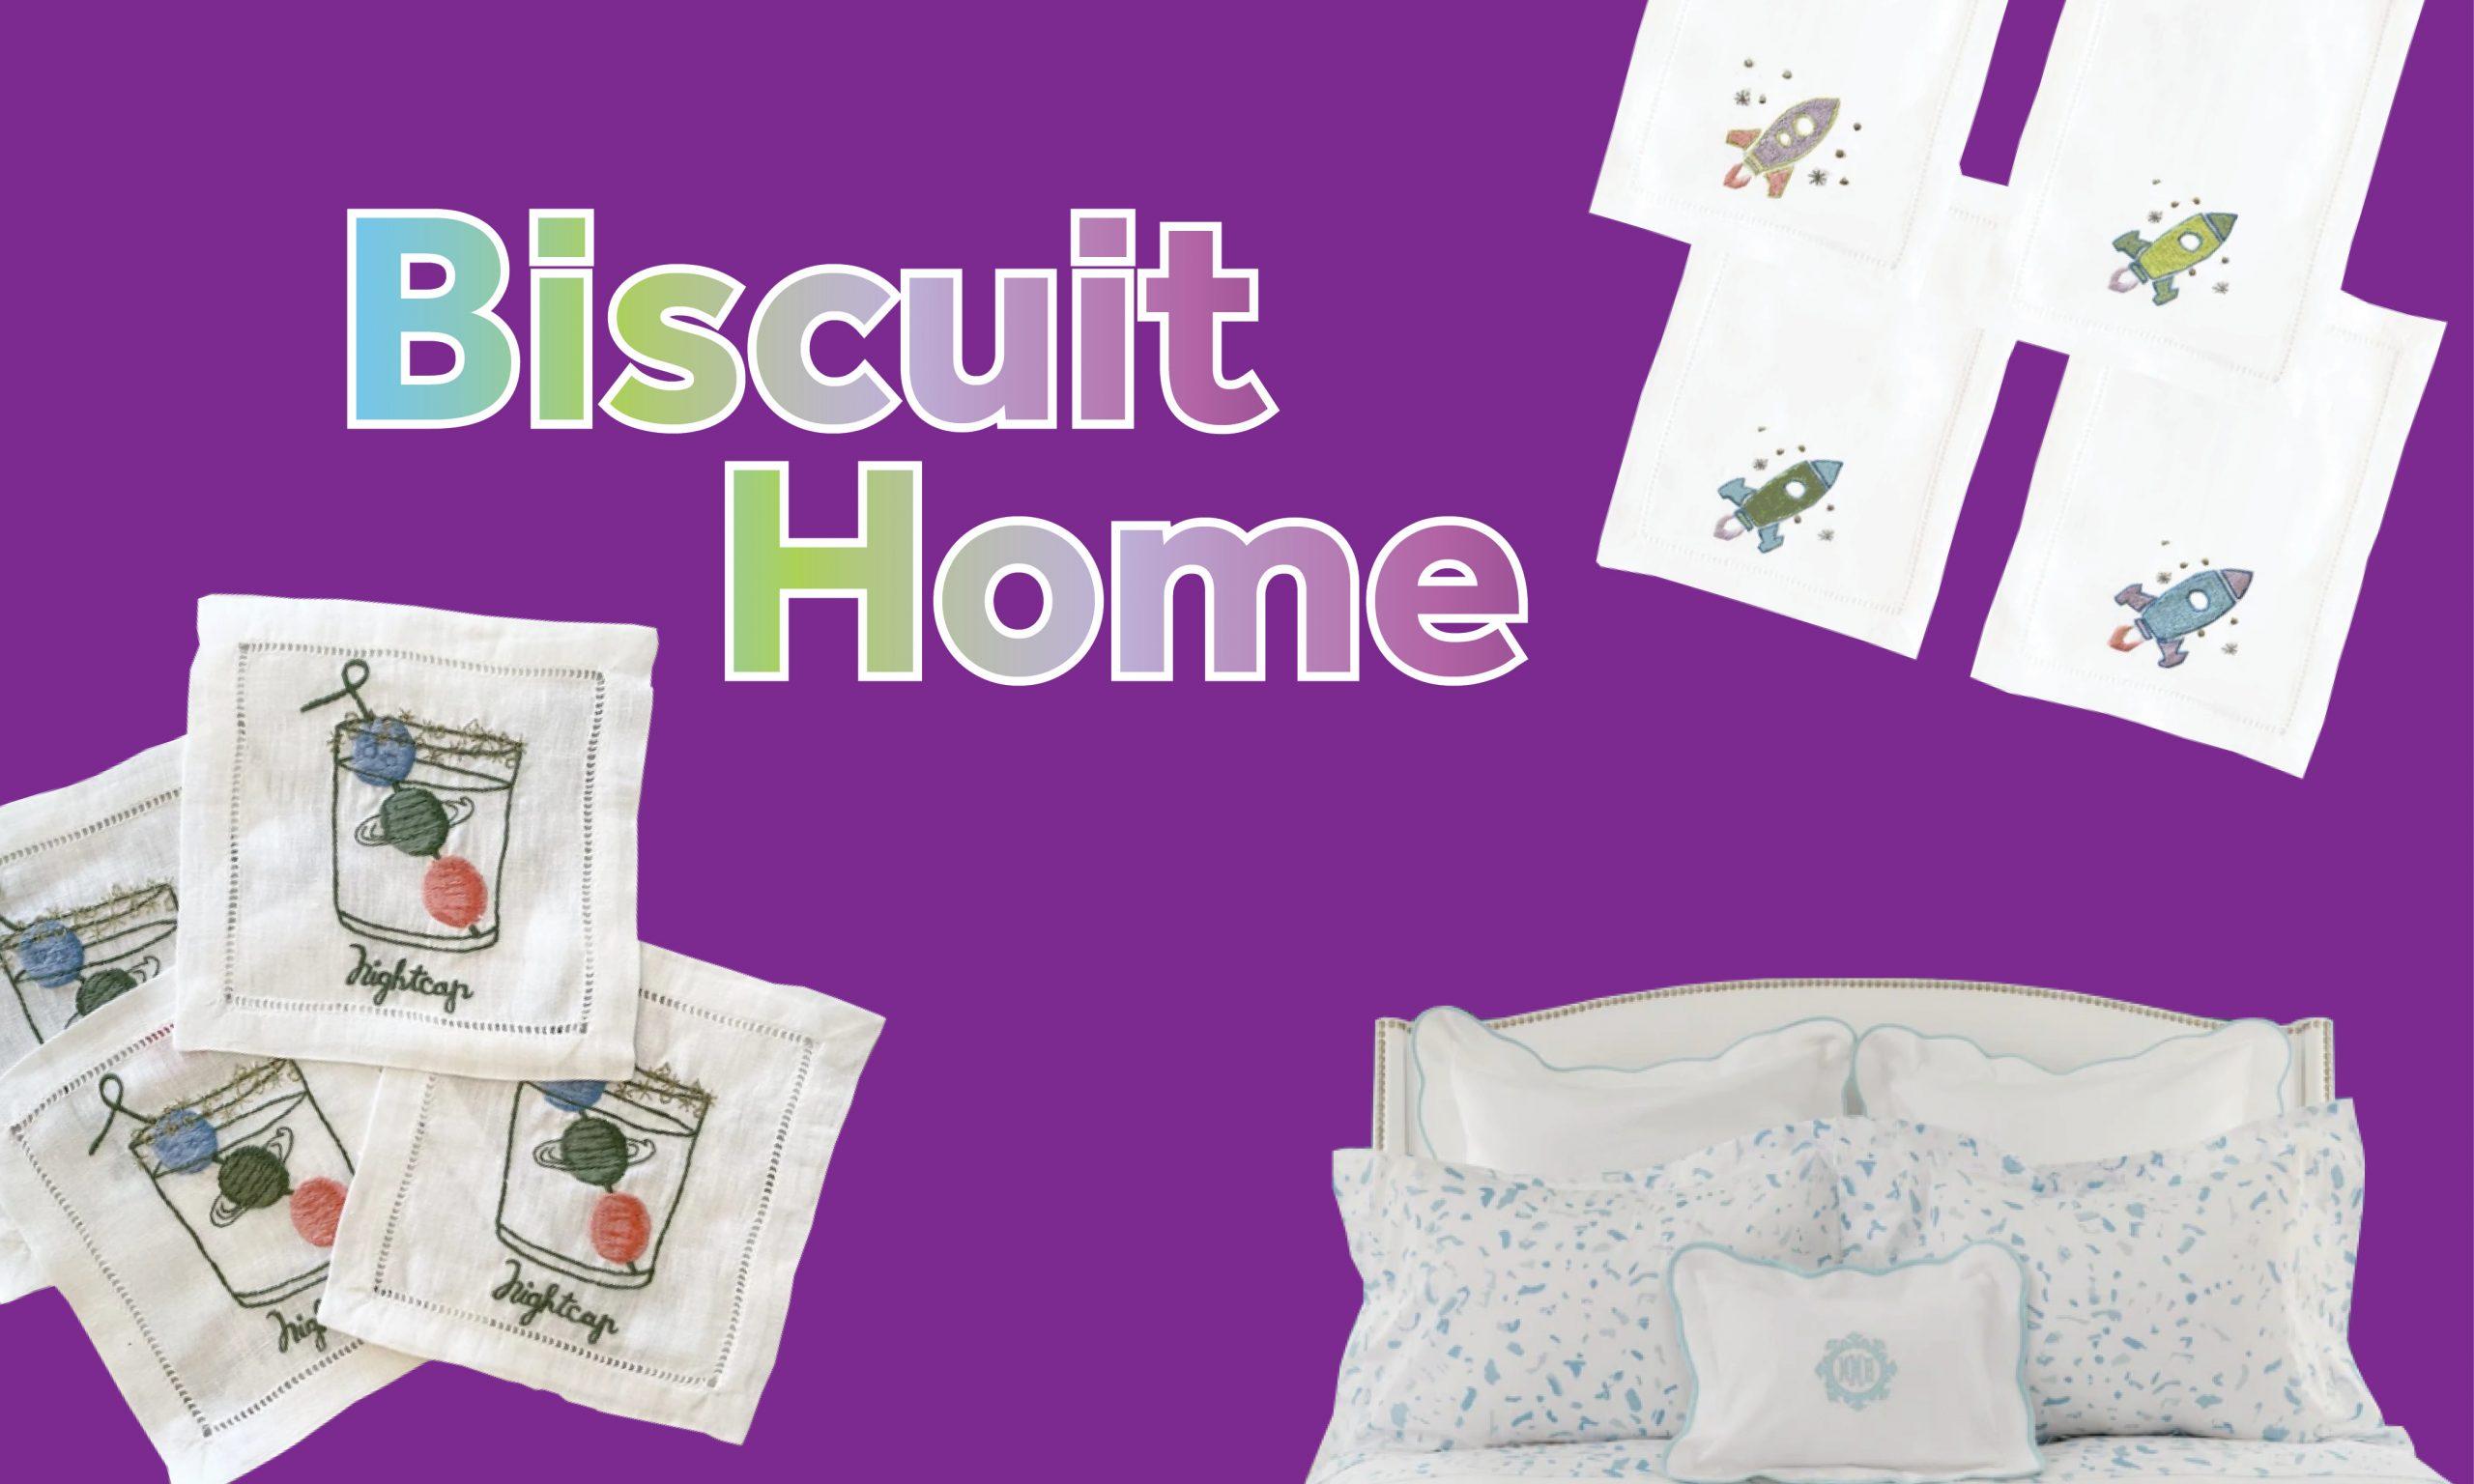 Biscuit Home